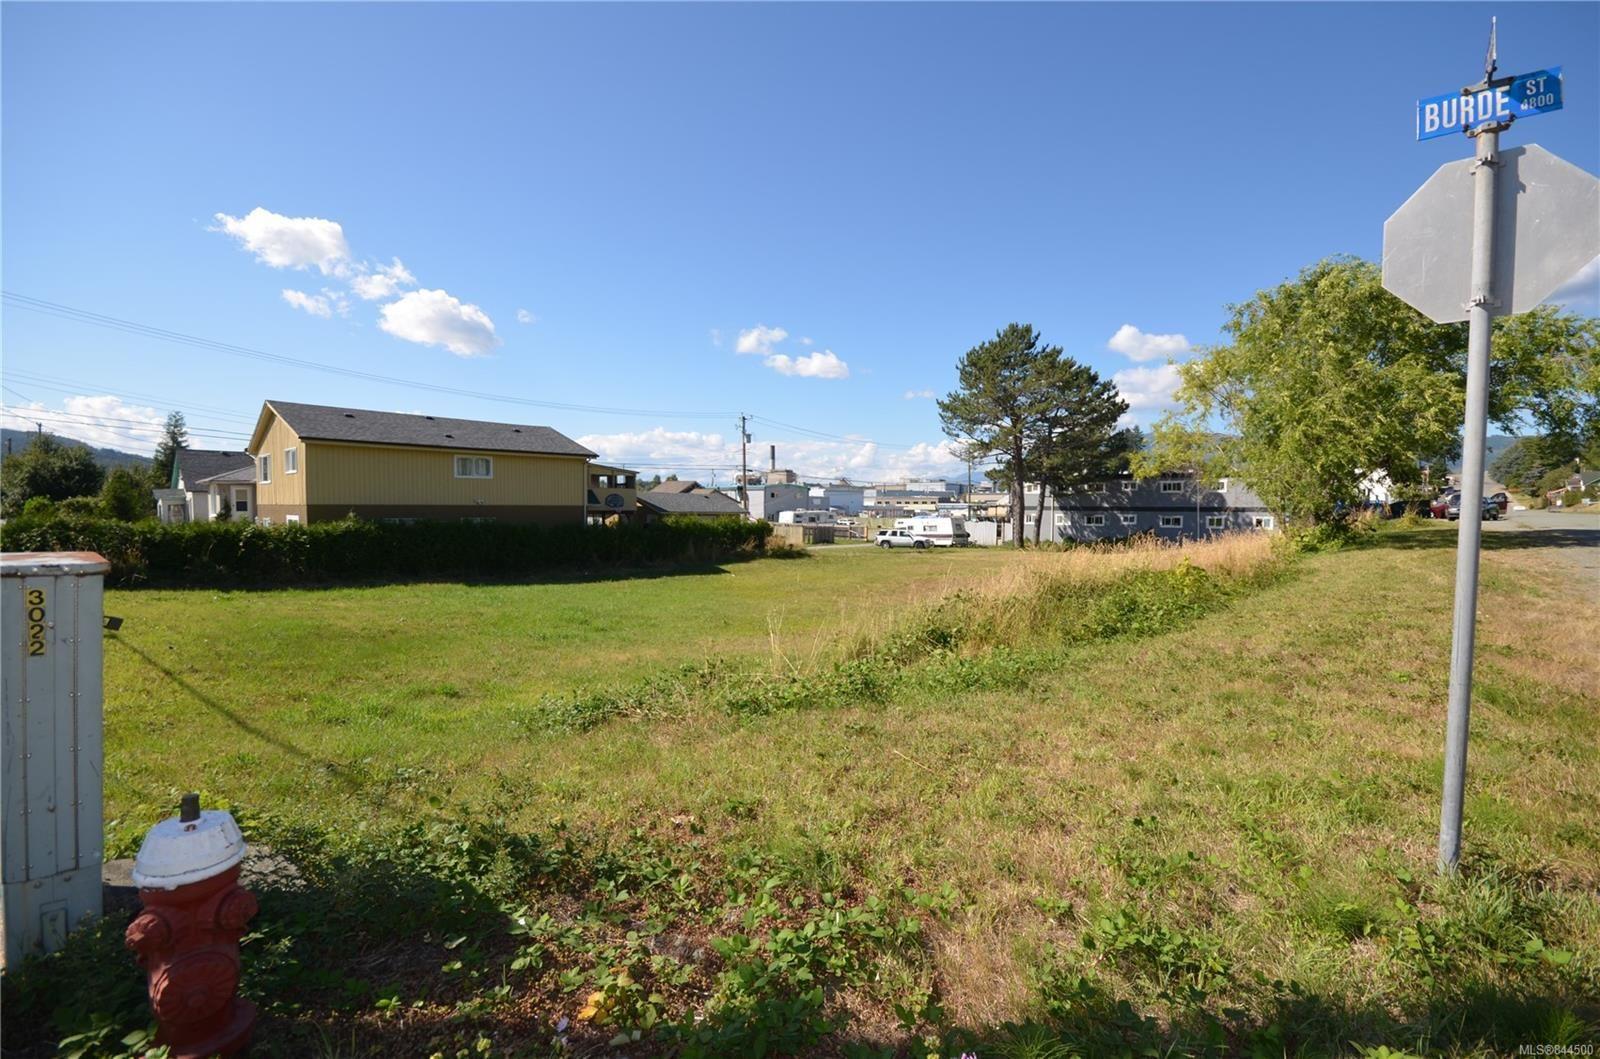 Main Photo: 3614 5th Ave in PORT ALBERNI: PA Port Alberni Multi Family for sale (Port Alberni)  : MLS®# 844500